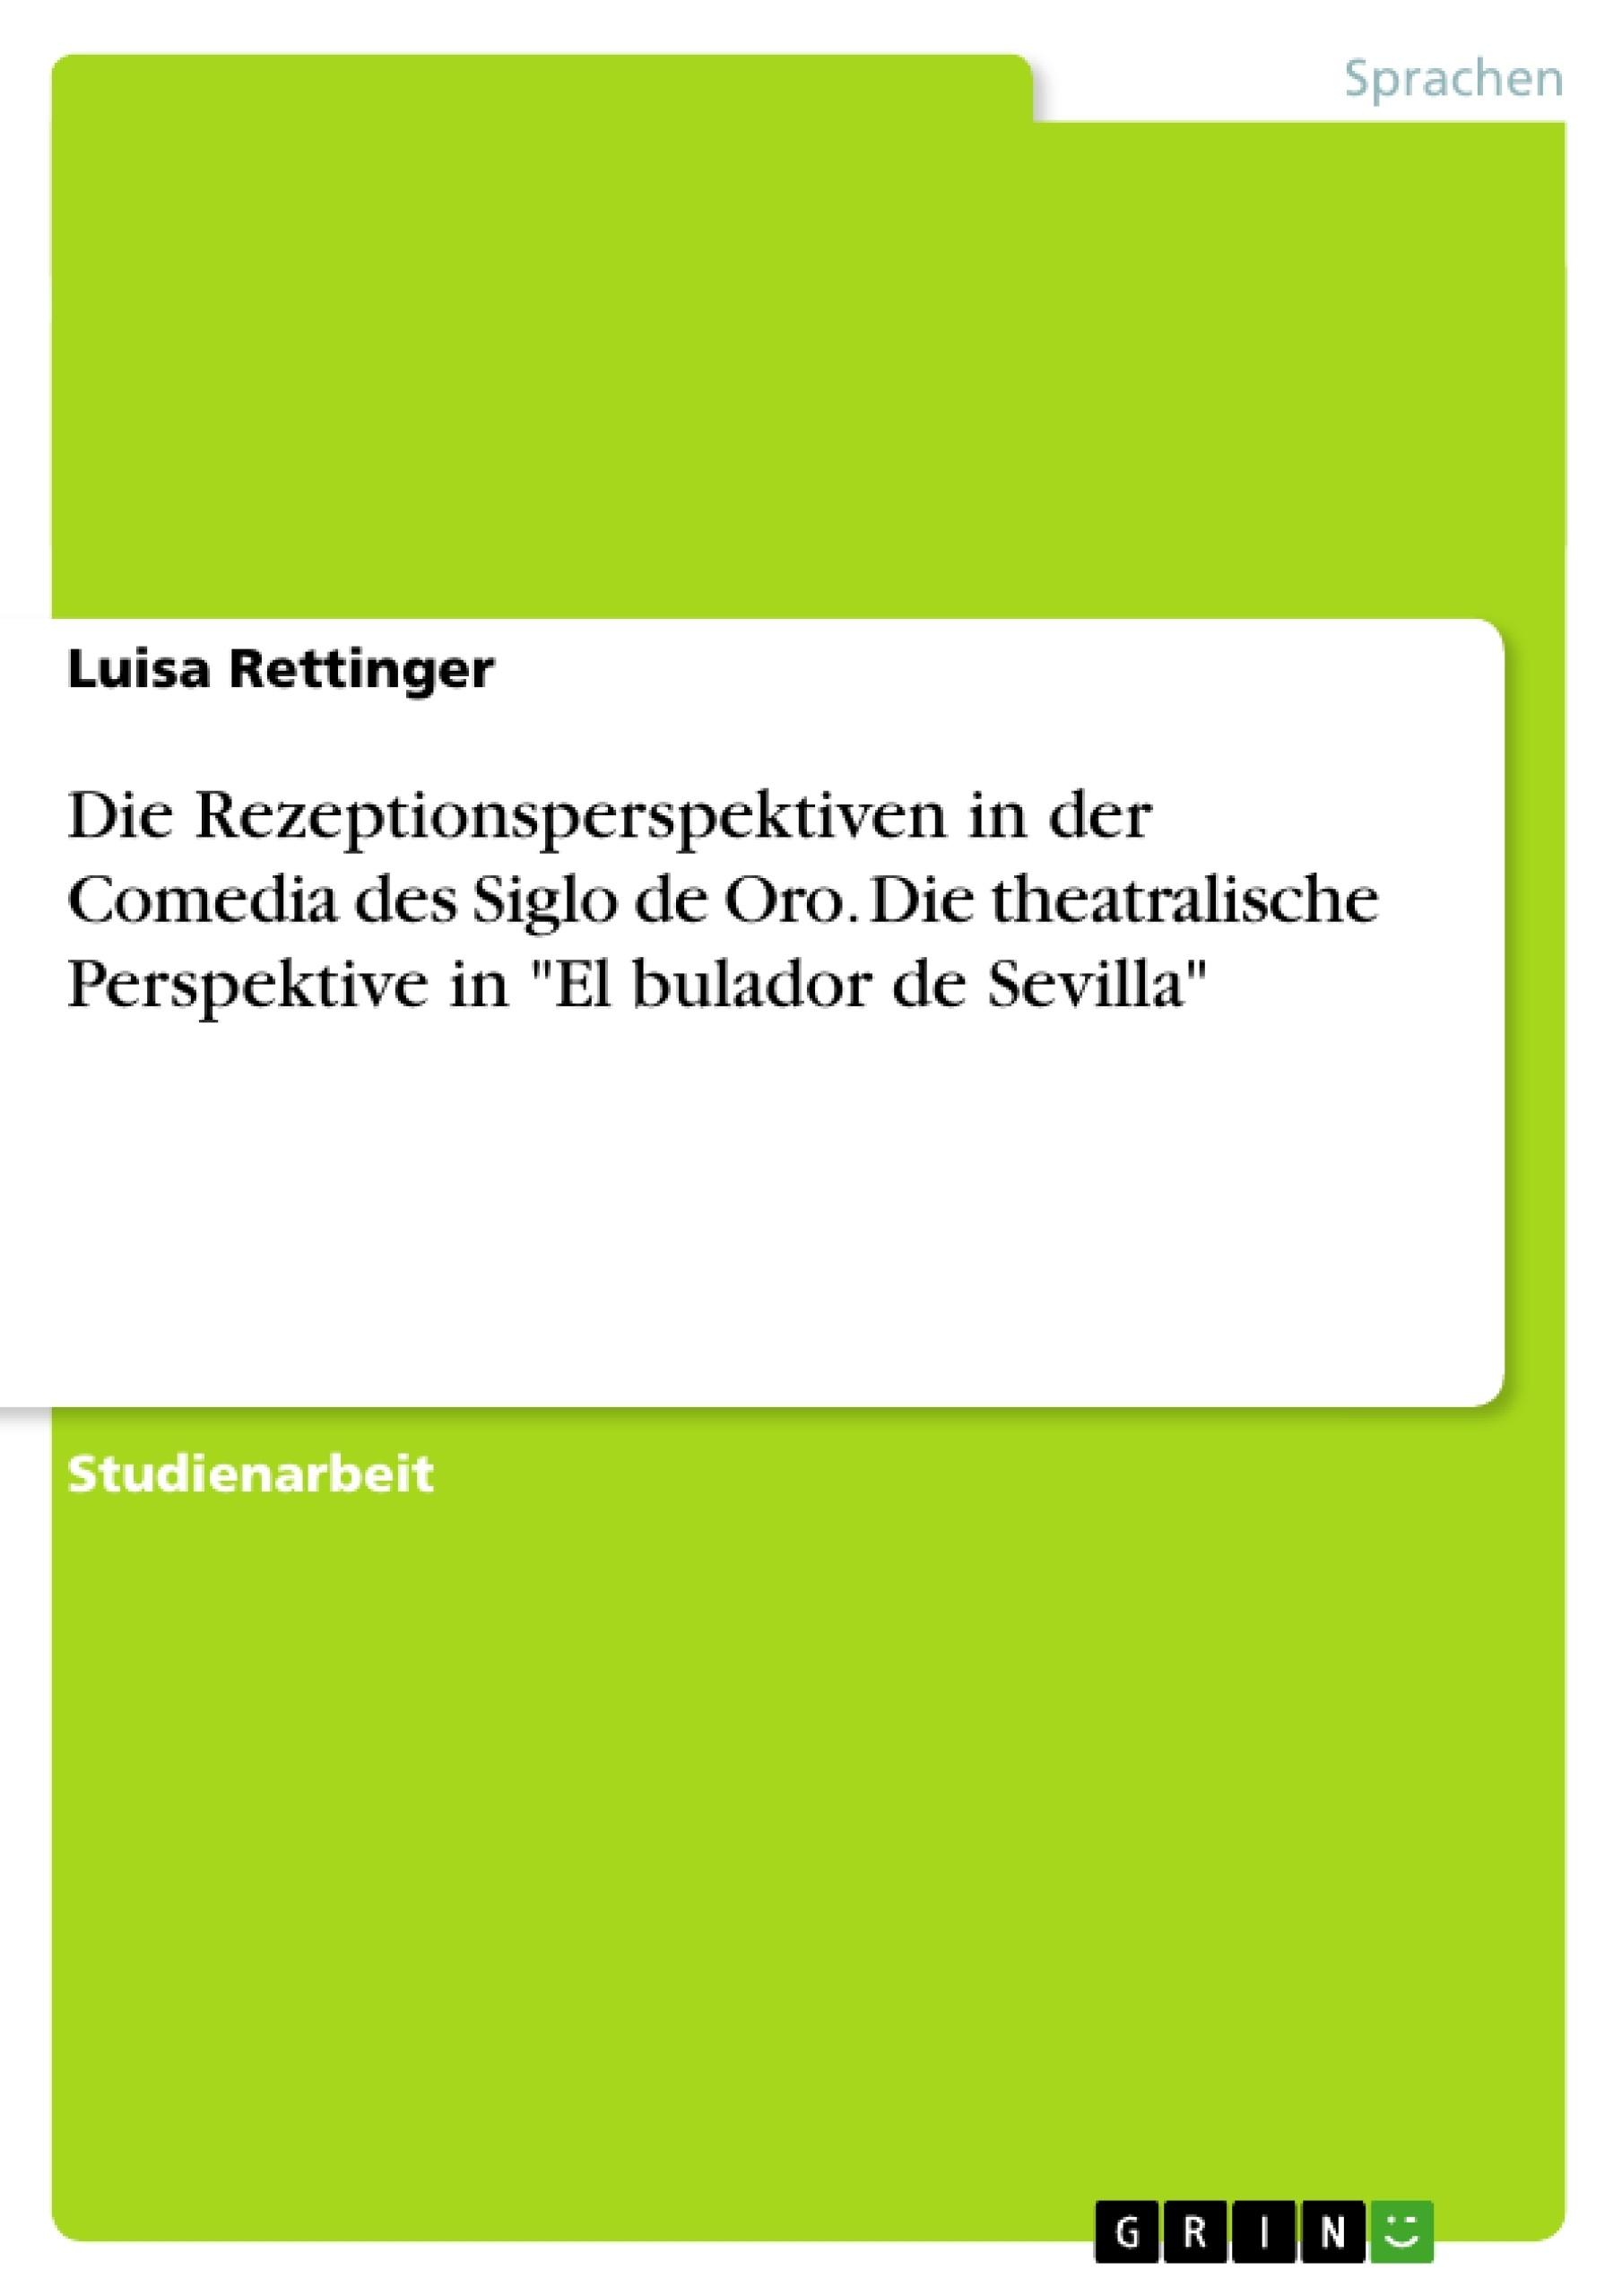 "Titel: Die Rezeptionsperspektiven in der Comedia des Siglo de Oro. Die theatralische Perspektive in ""El bulador de Sevilla"""